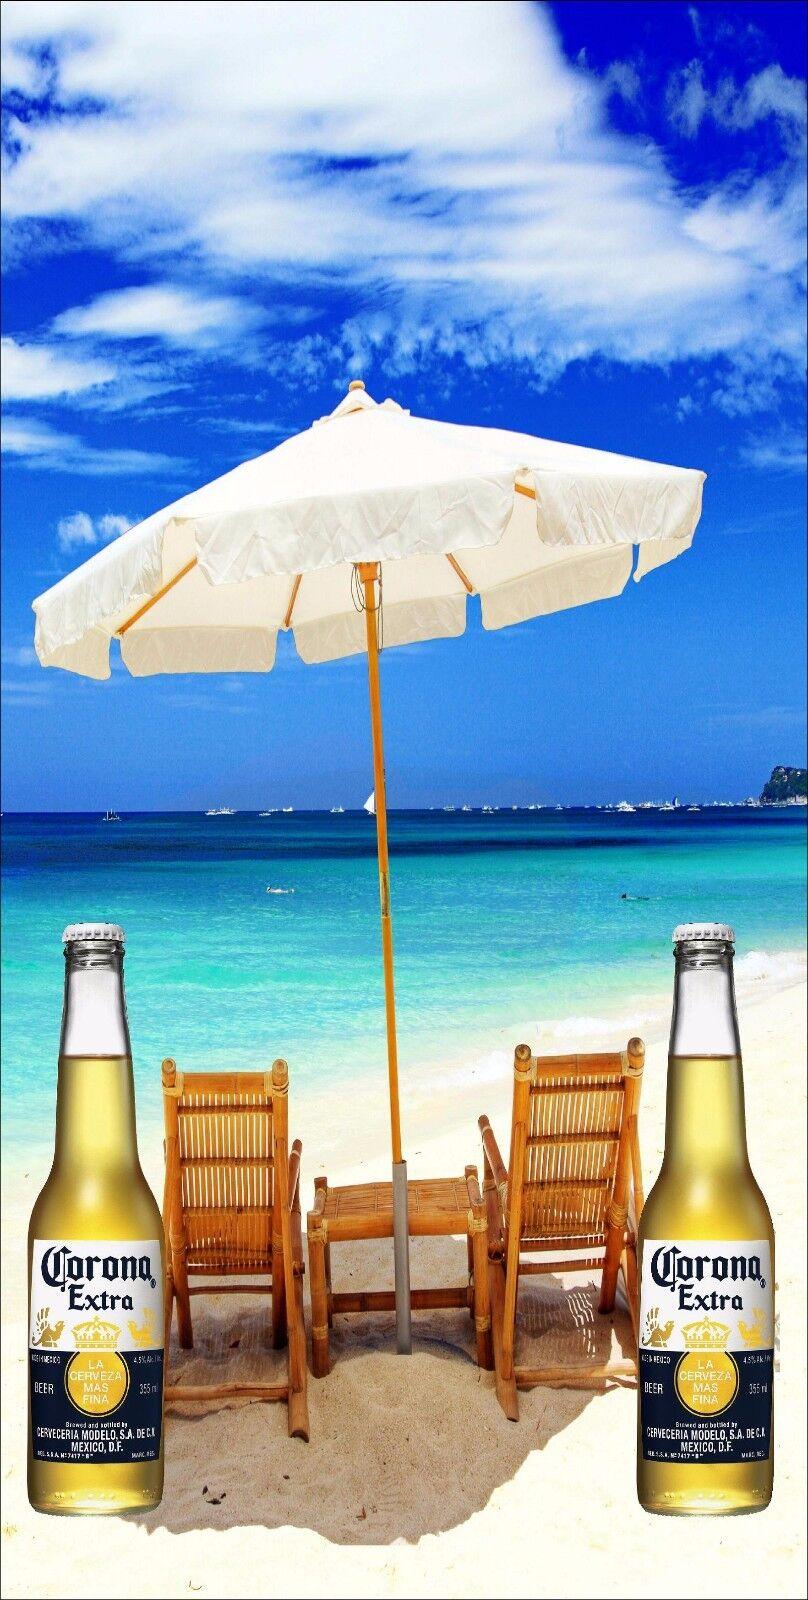 Cgoldna Bottle on Beach Cornhole Baggo Bag Toss Board 3M Vinyl Wrap Set